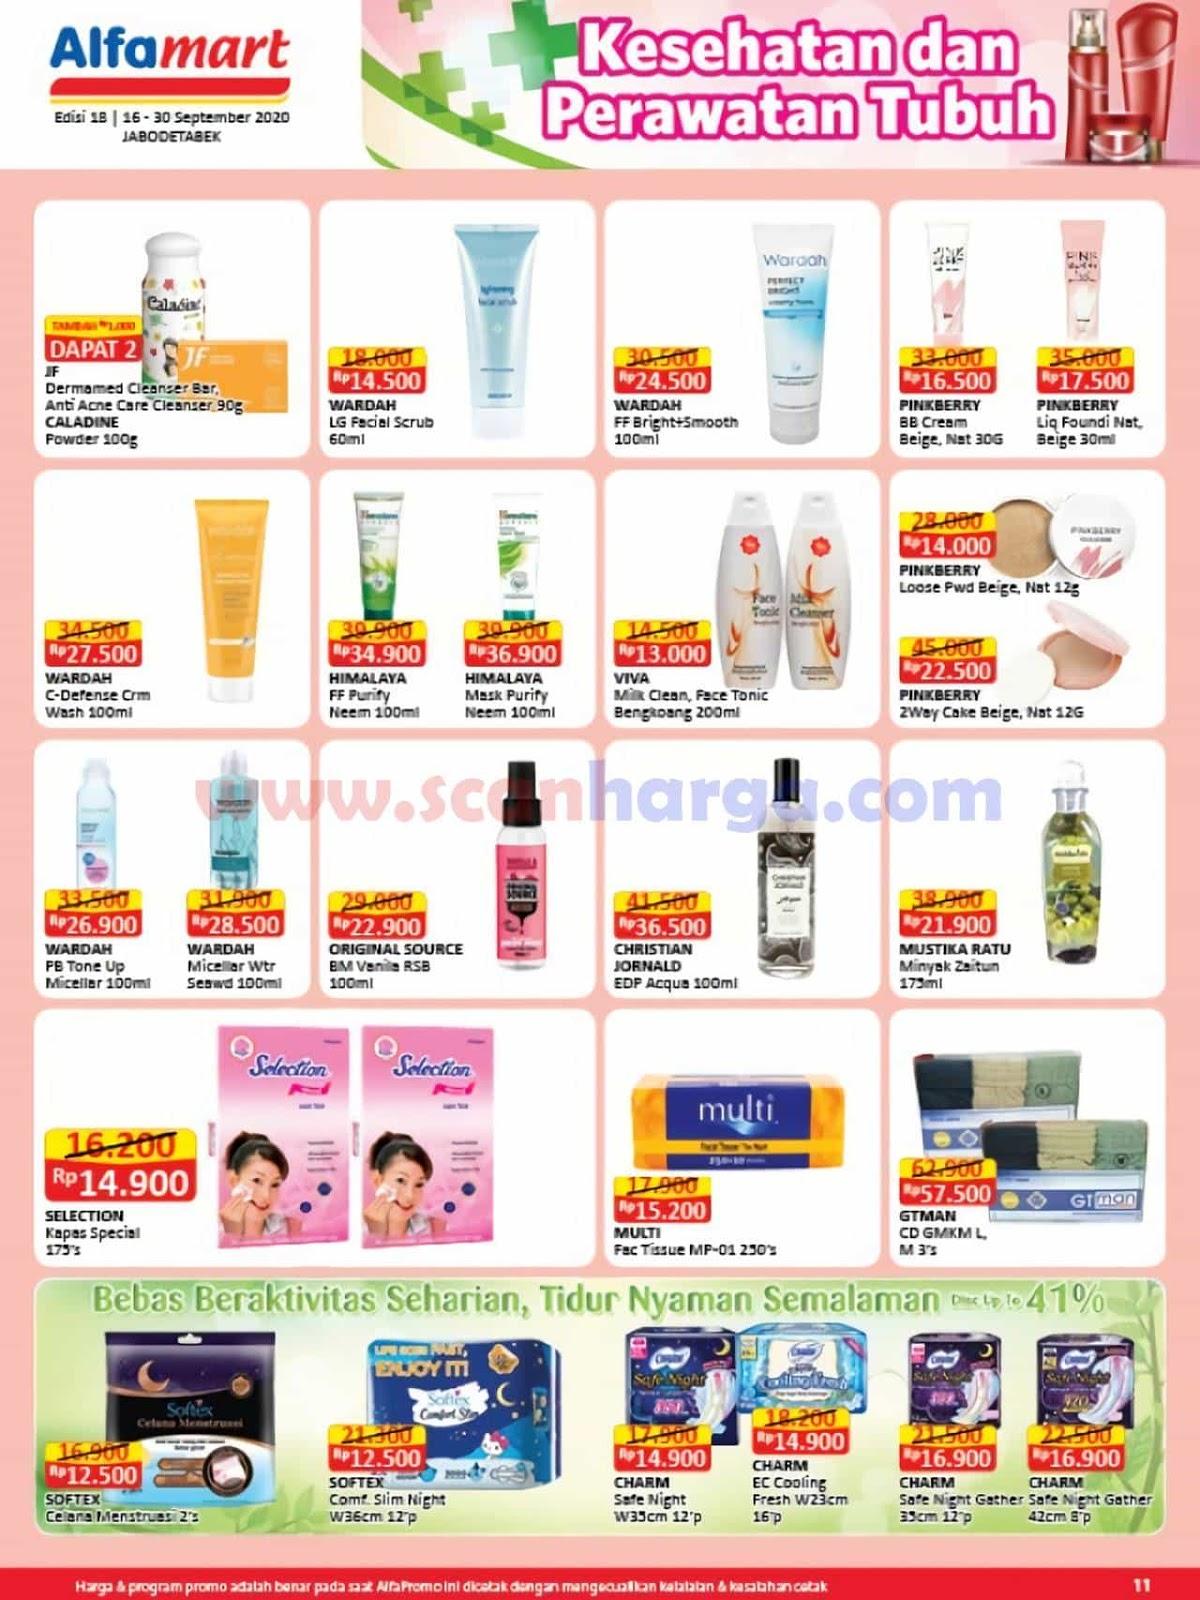 Katalog Promo Alfamart 16 - 30 September 2020 11